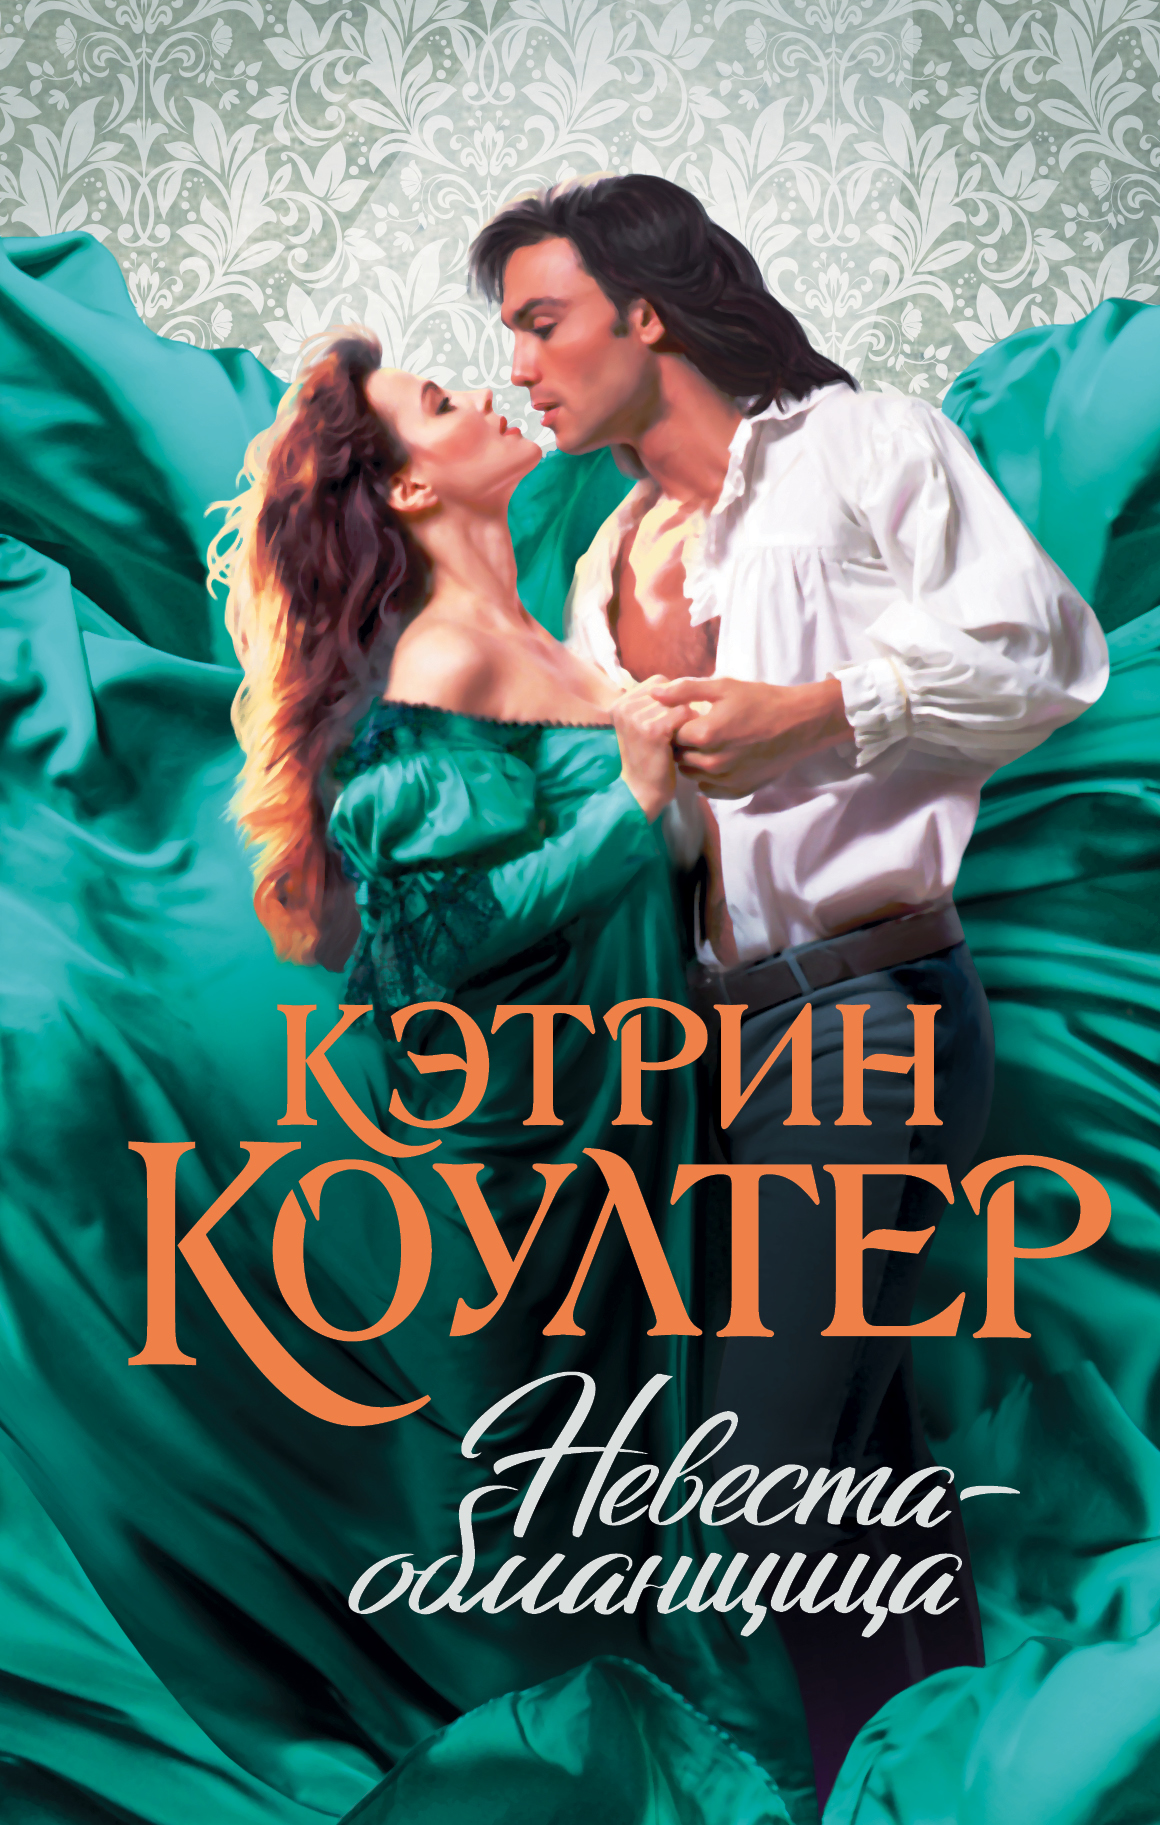 Zakazat.ru: Невеста-обманщица. Кэтрин Коултер